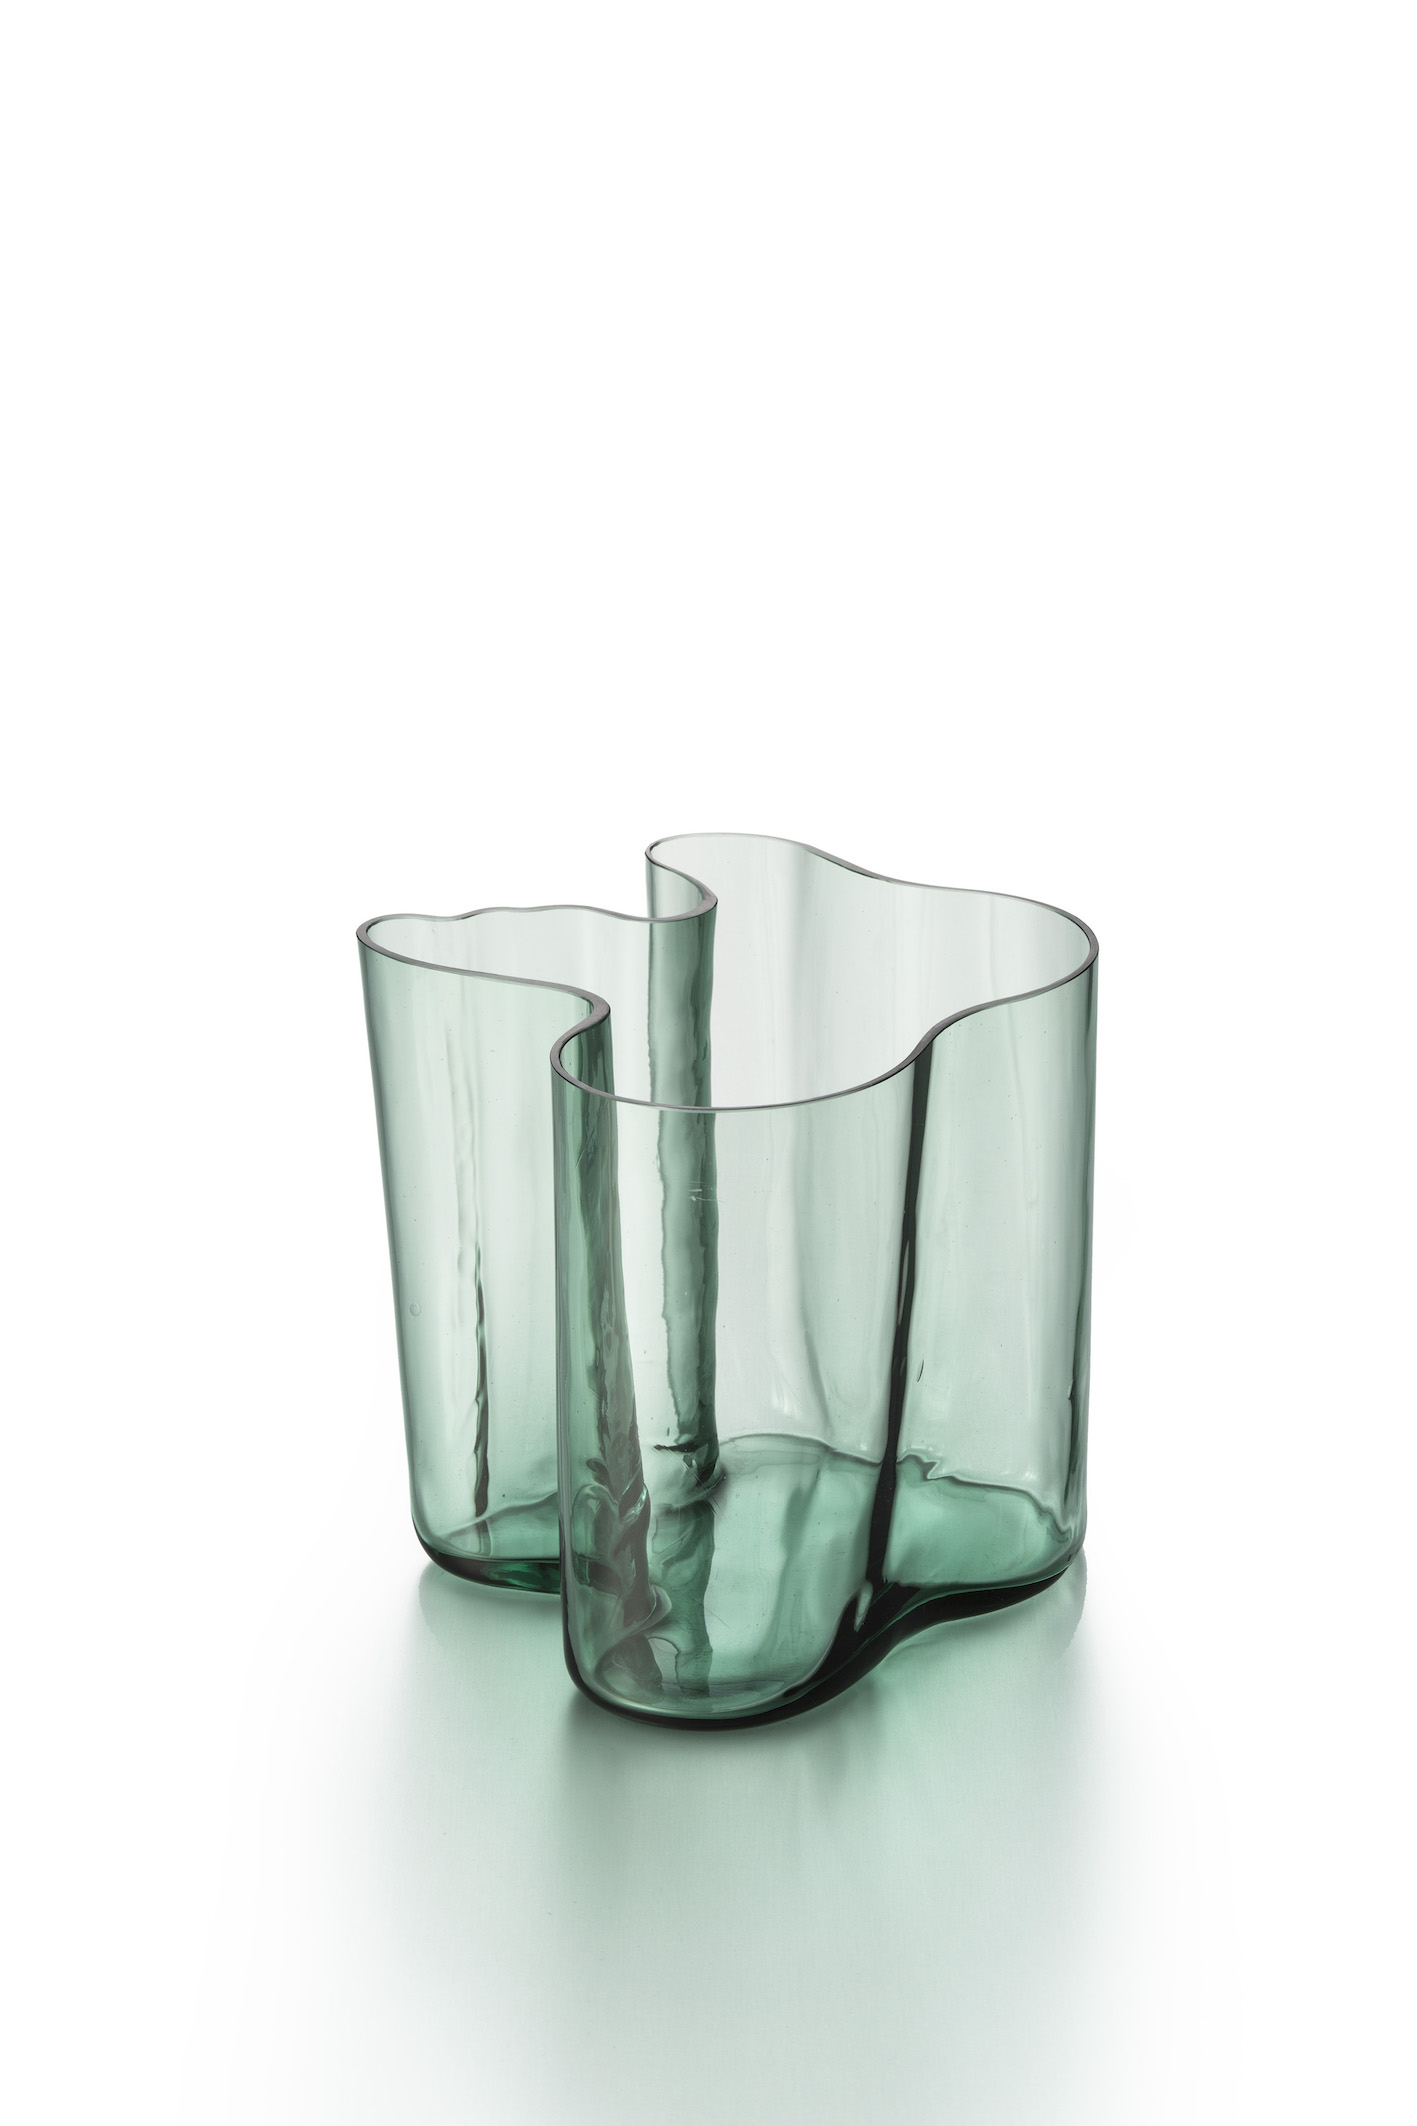 Alvar Aalto, Vase, 1937.